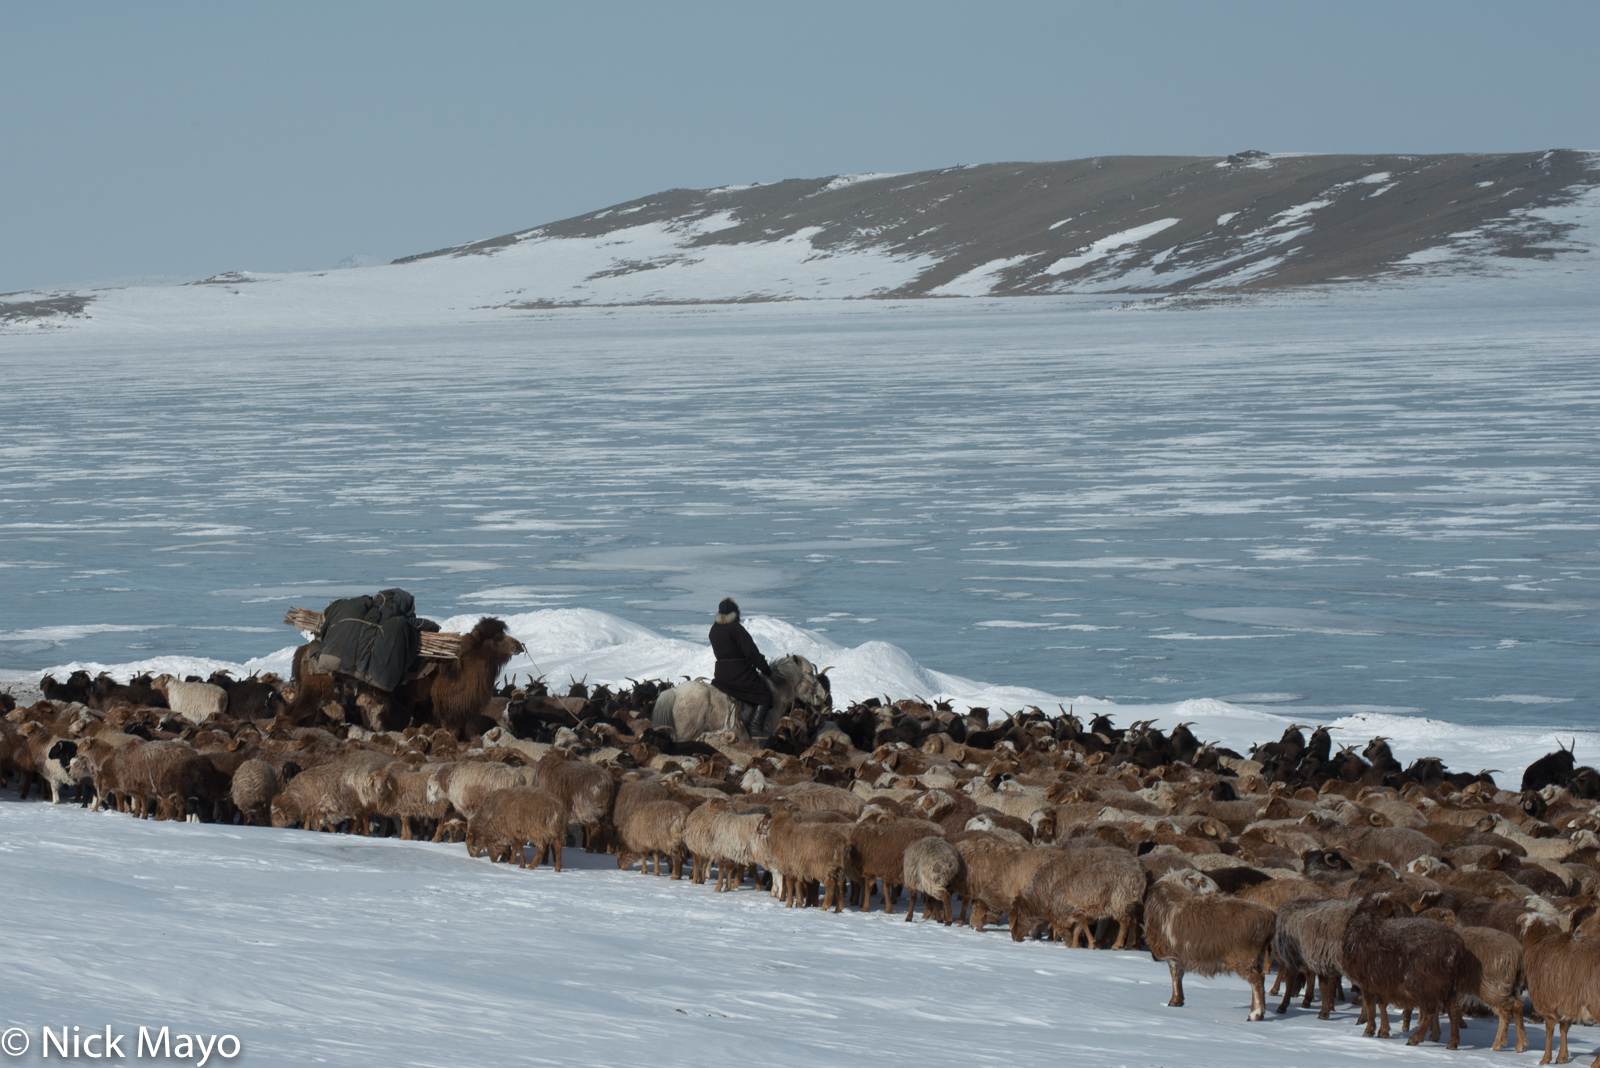 Bayan-Ölgii, Camel, Goat, Horse, Kazakh, Mongolia, Pack Animal, Sheep, photo